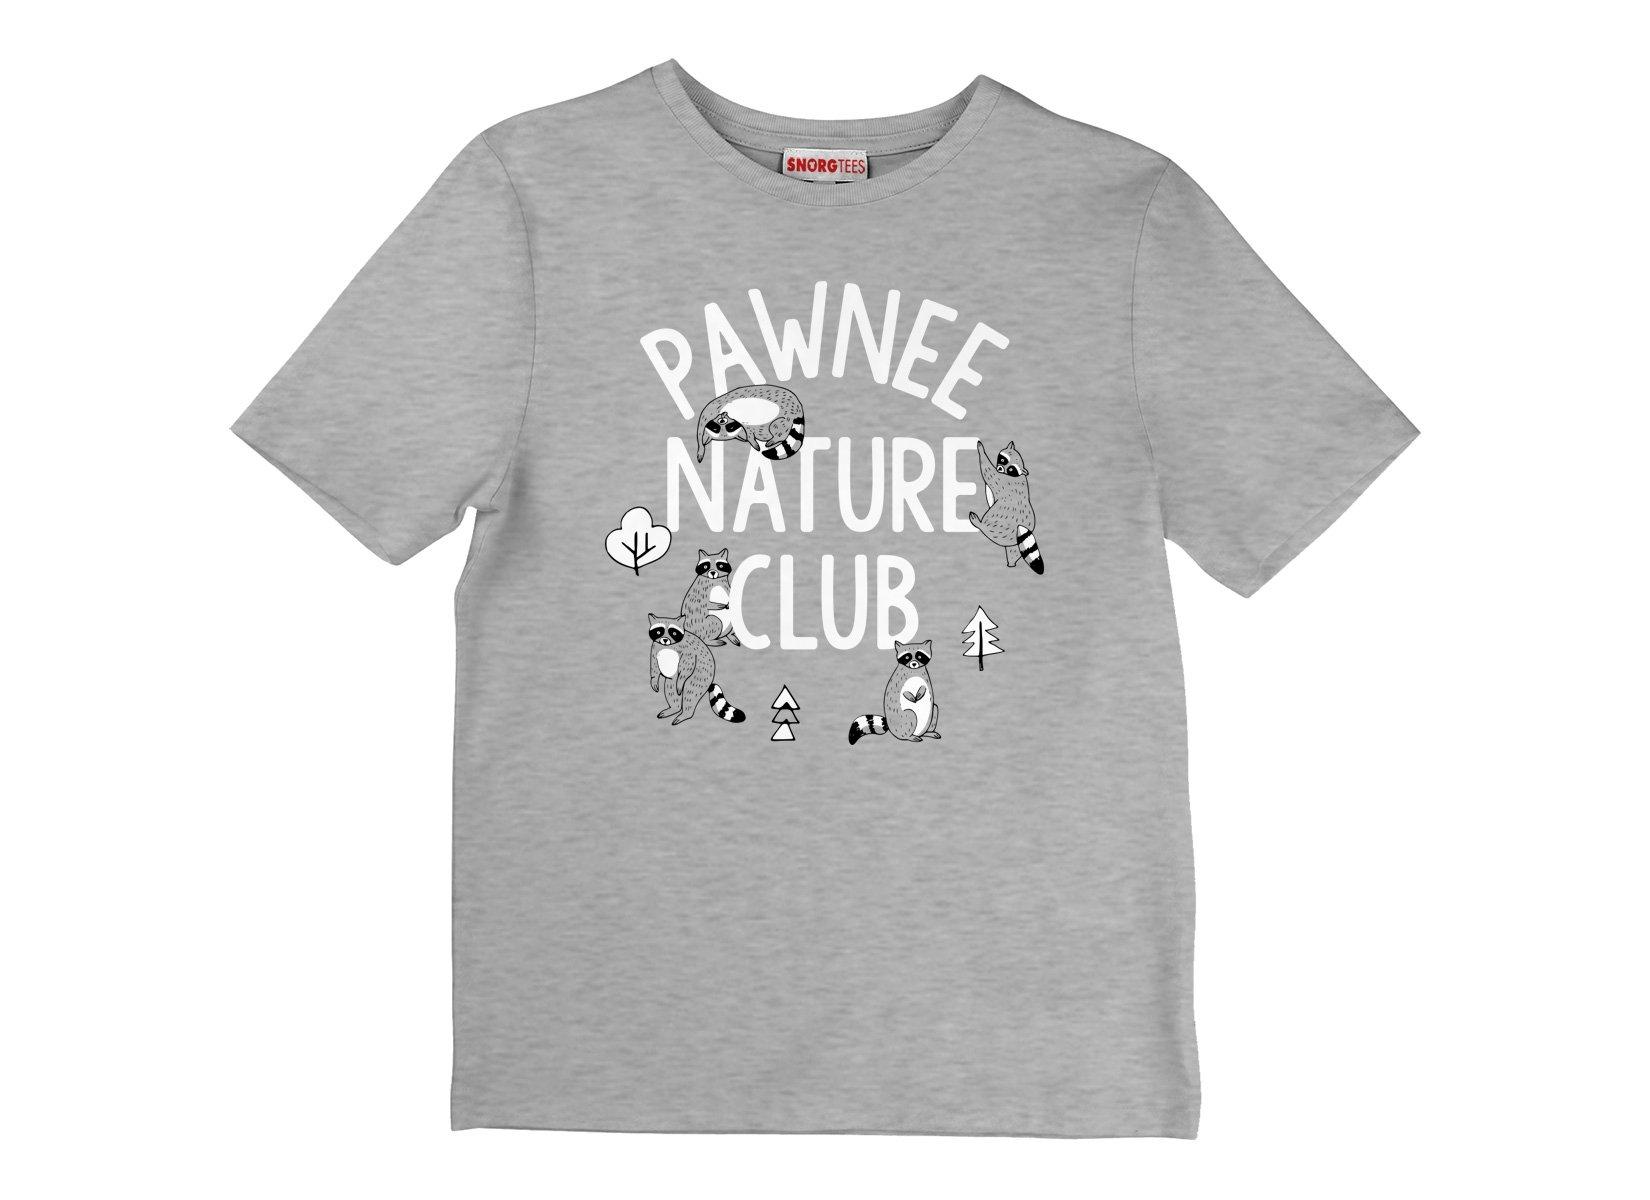 Pawnee Nature Club on Kids T-Shirt